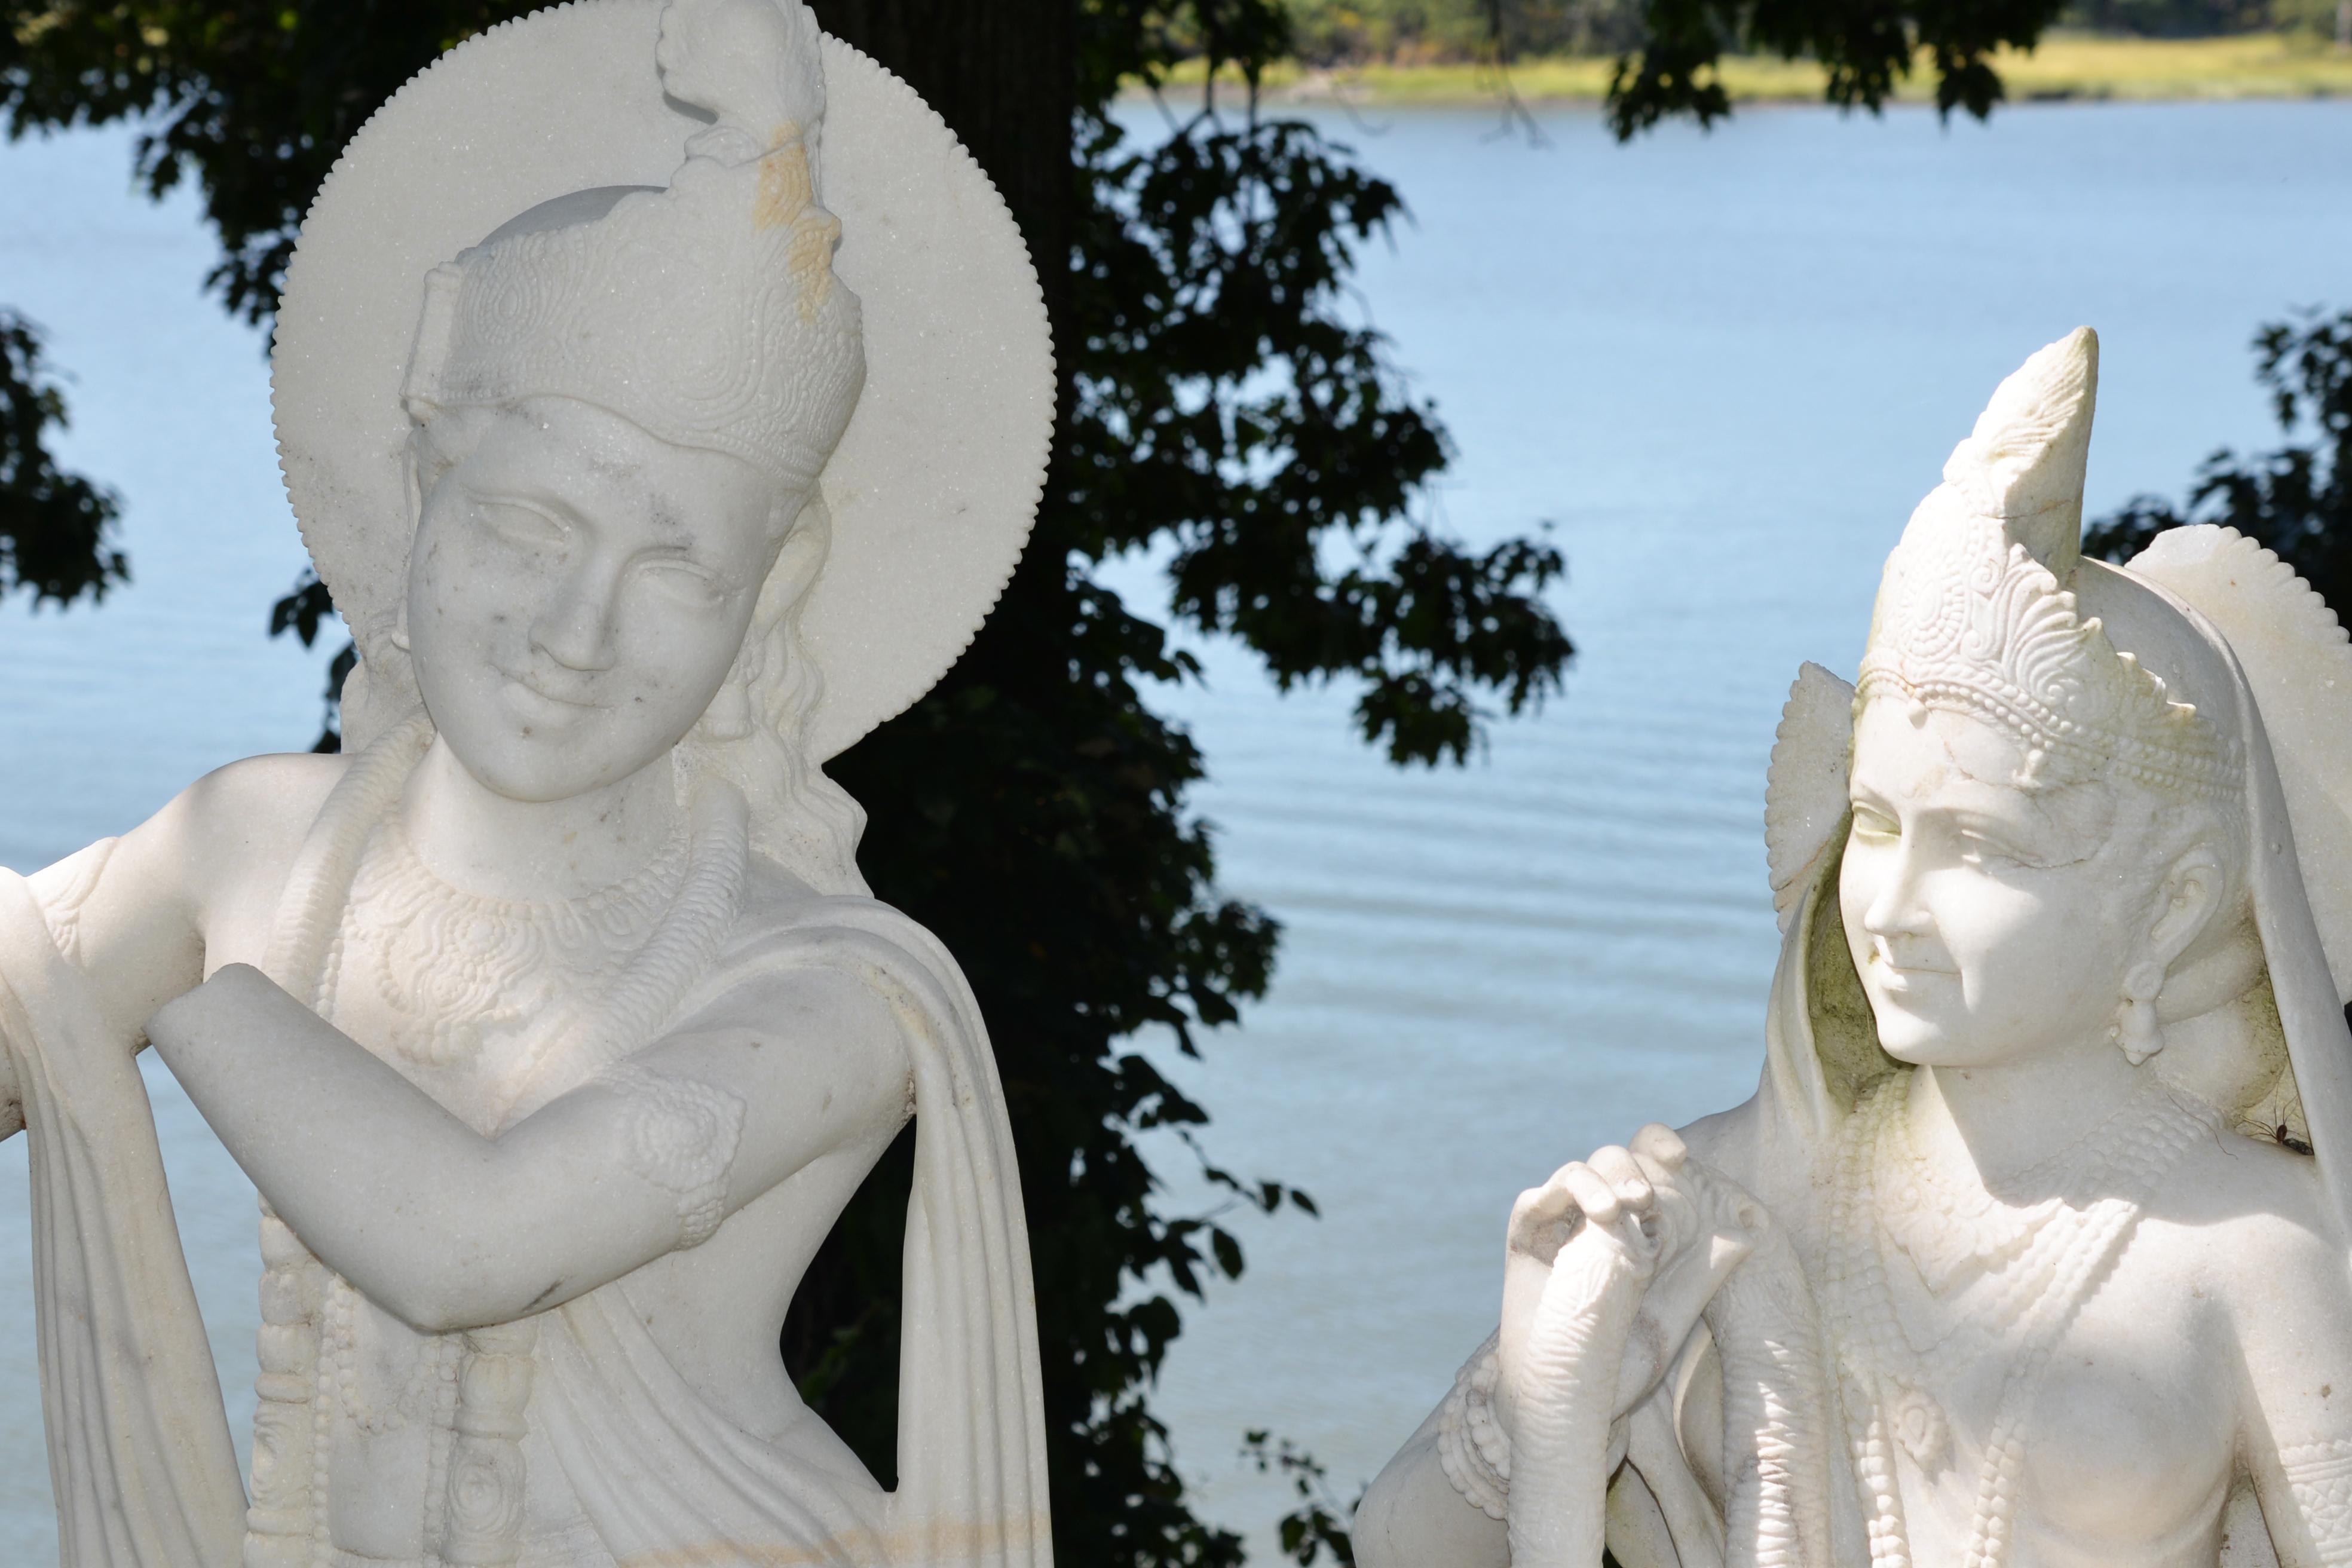 Statues at Wainwright House in Rye, NY